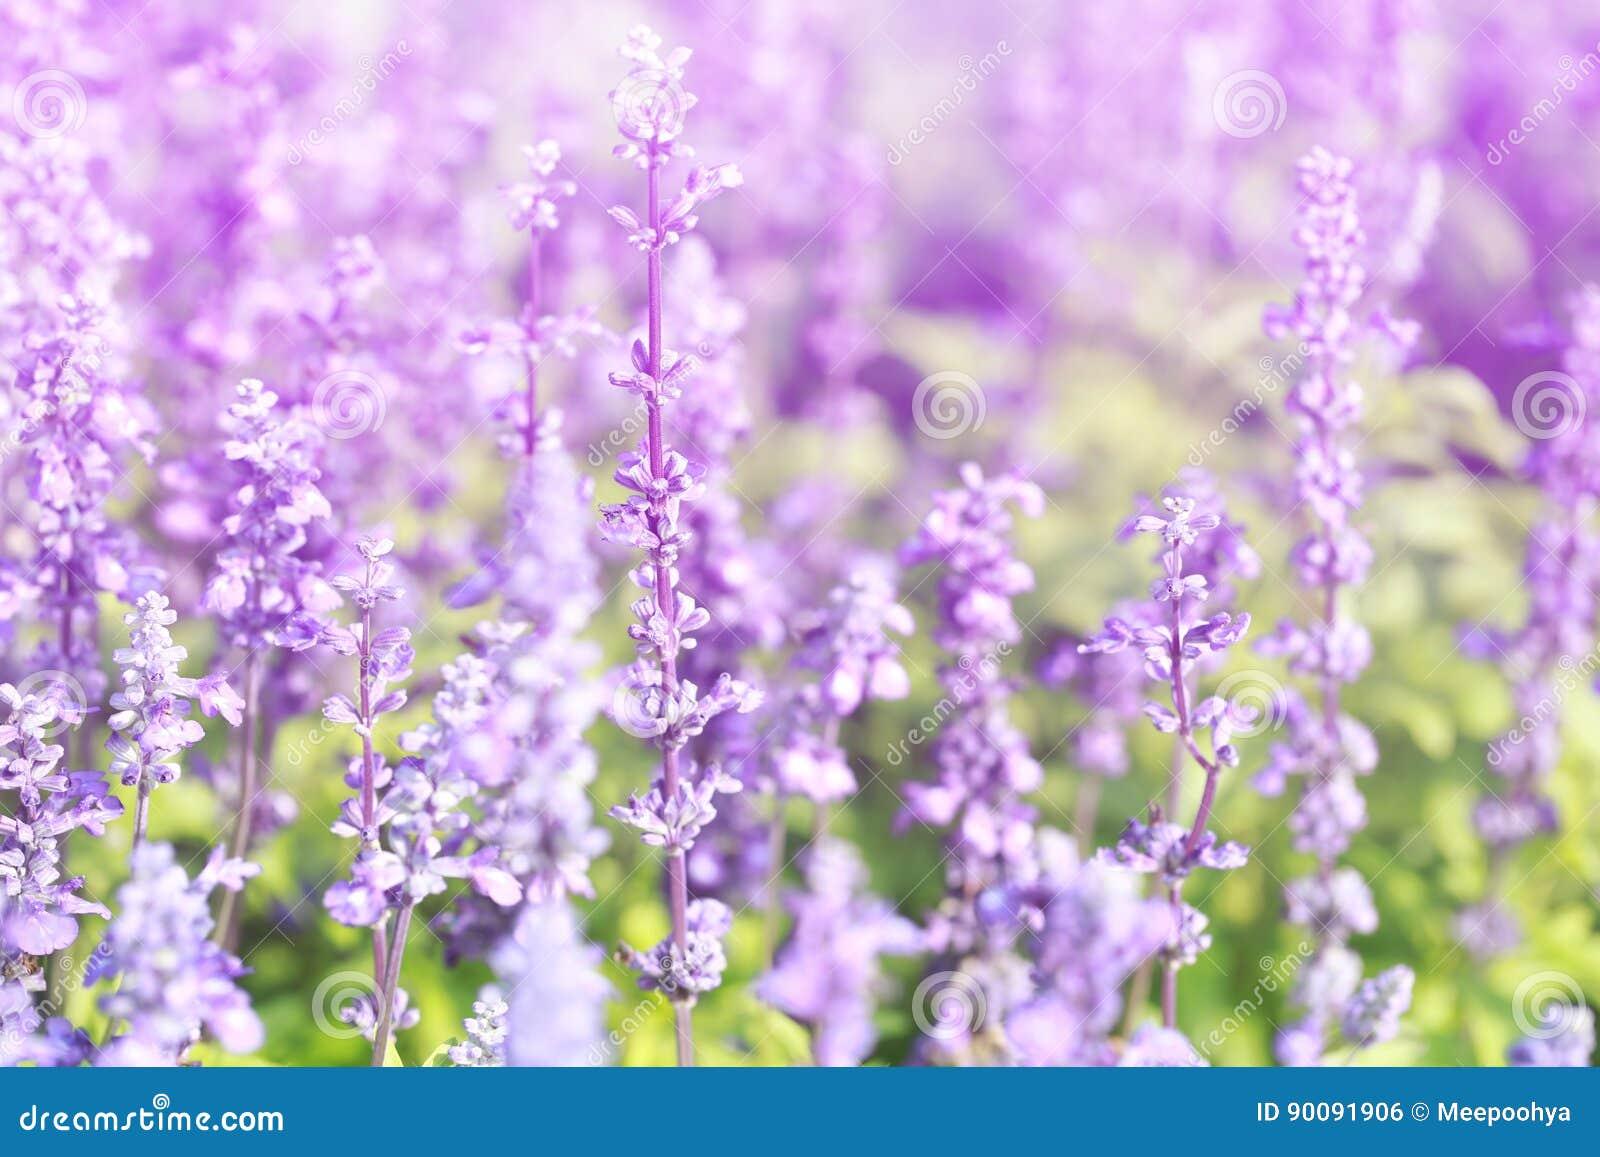 Lavender flowers blooming Vintage color in the garden.